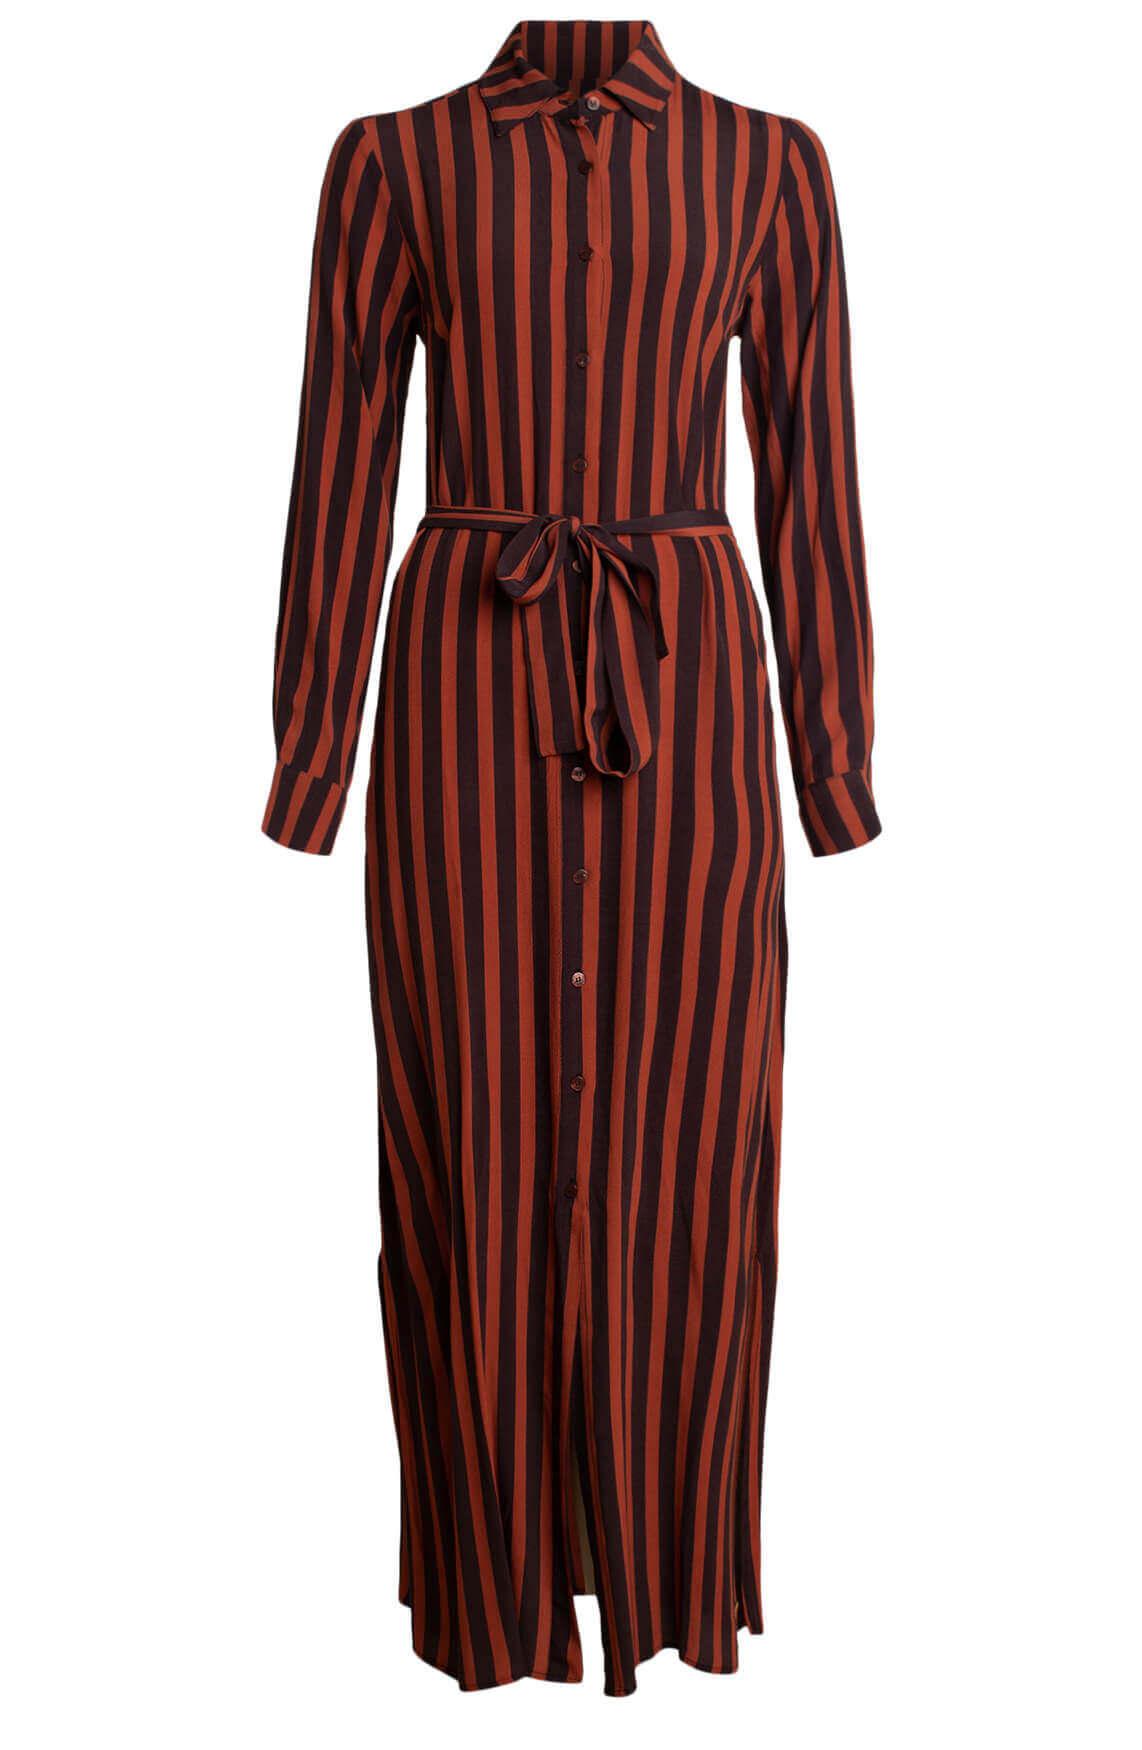 Moscow Dames Lange gestreepte jurk Bruin